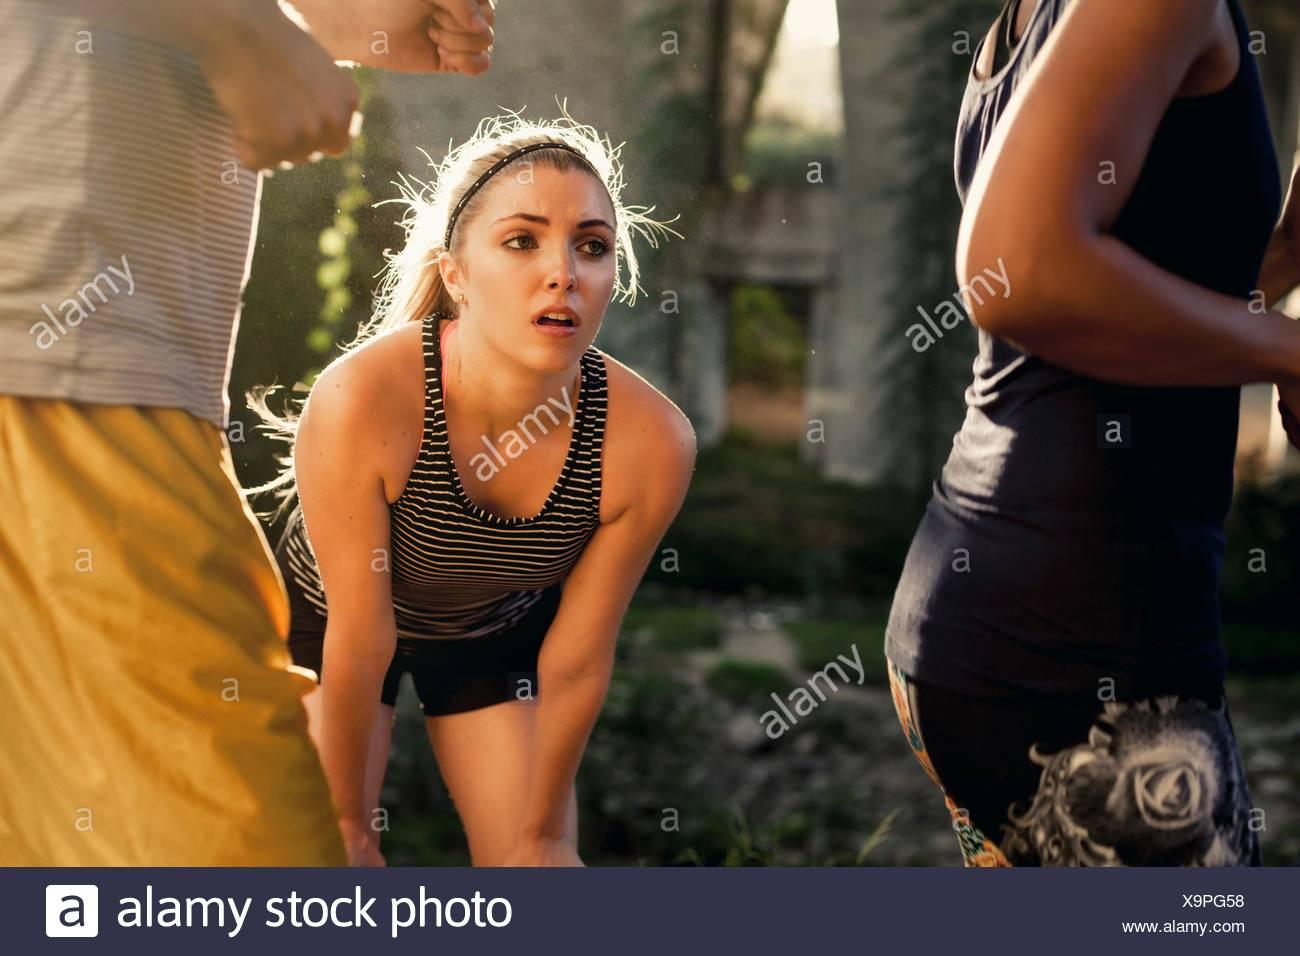 Joggers running past jogger taking break, Arroyo Seco Park, Pasadena, California, USA - Stock Image